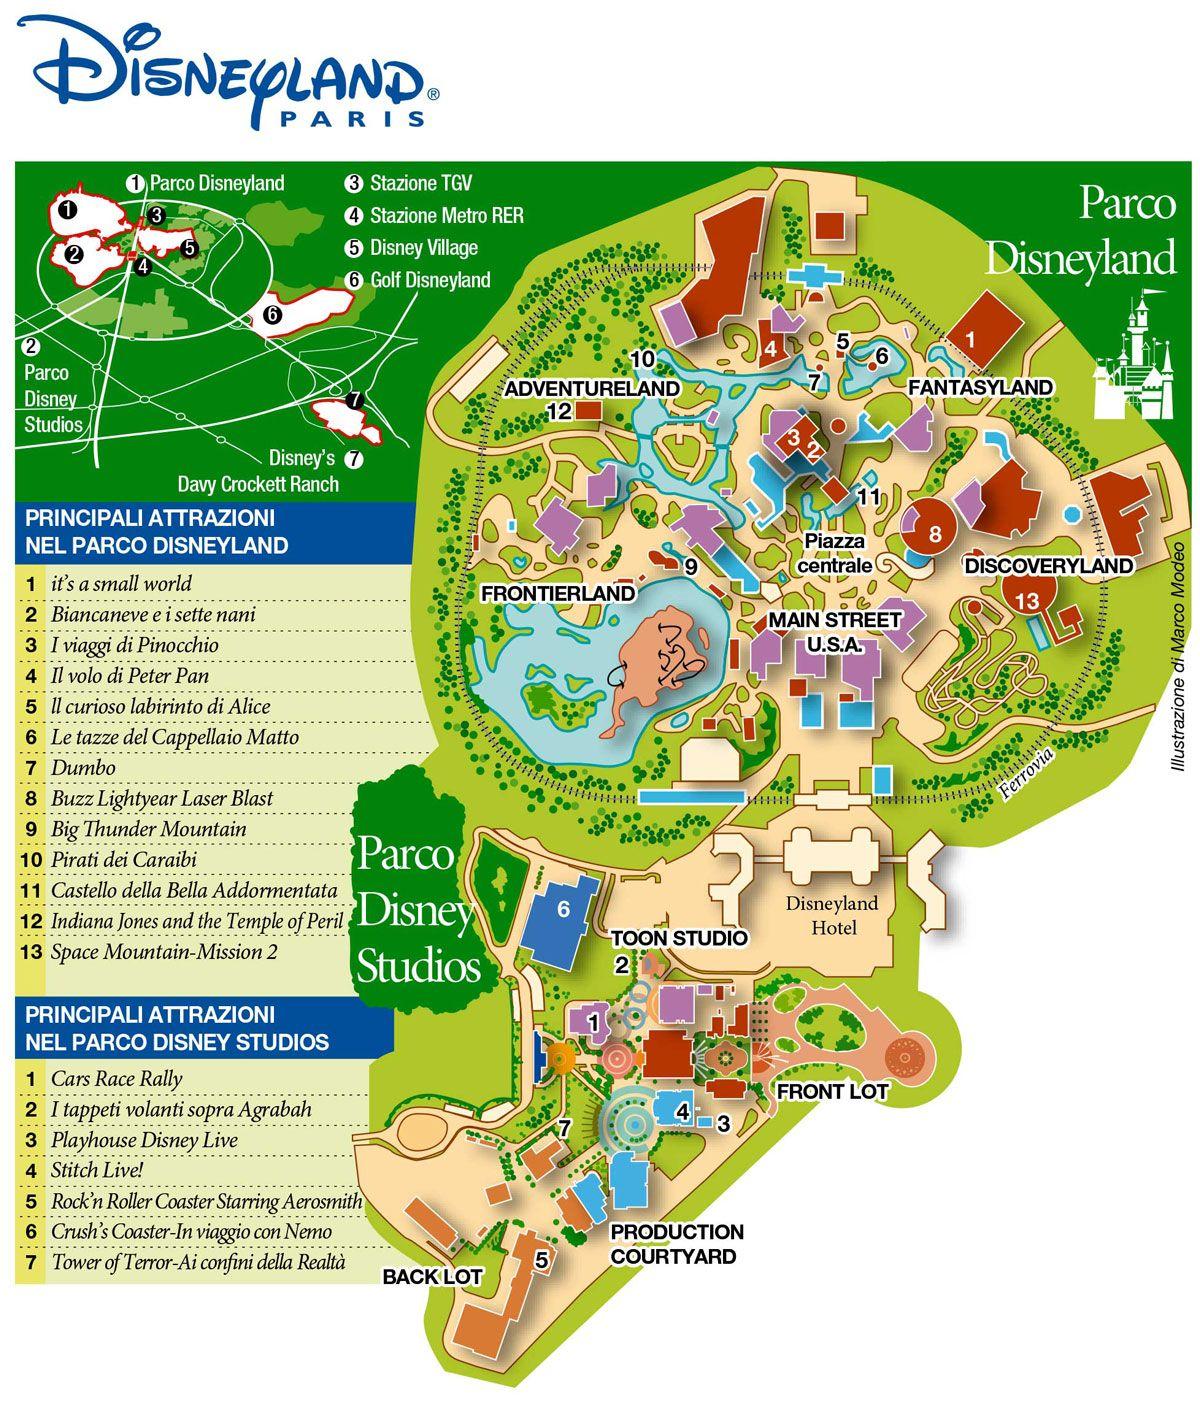 Disneyland paris map 2019 | Disneyland paris, Paris map, Disneyland